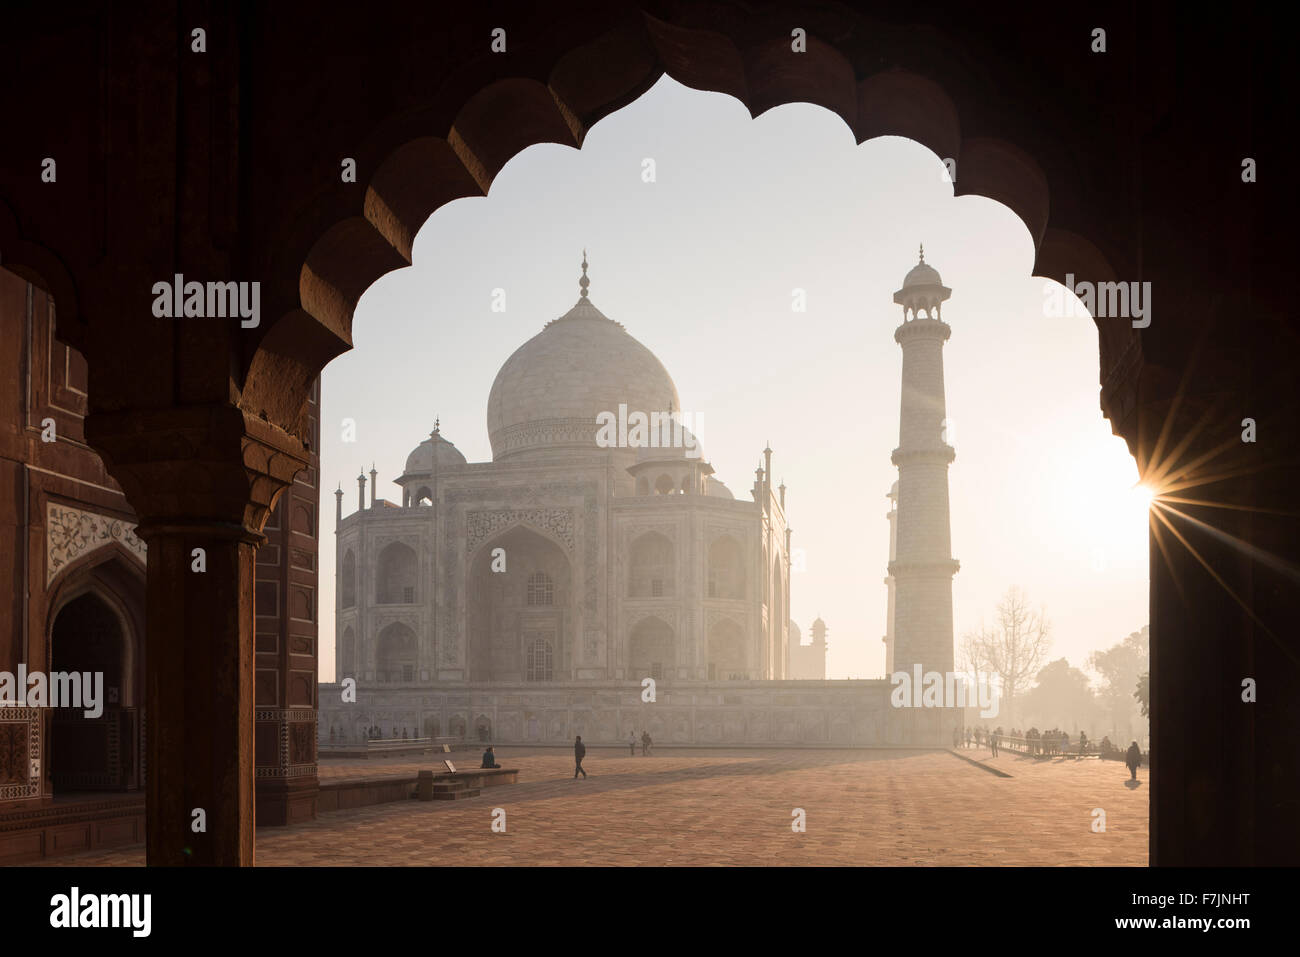 Dawn at The Taj Mahal, Agra, Uttar Pradesh, India Stock Photo